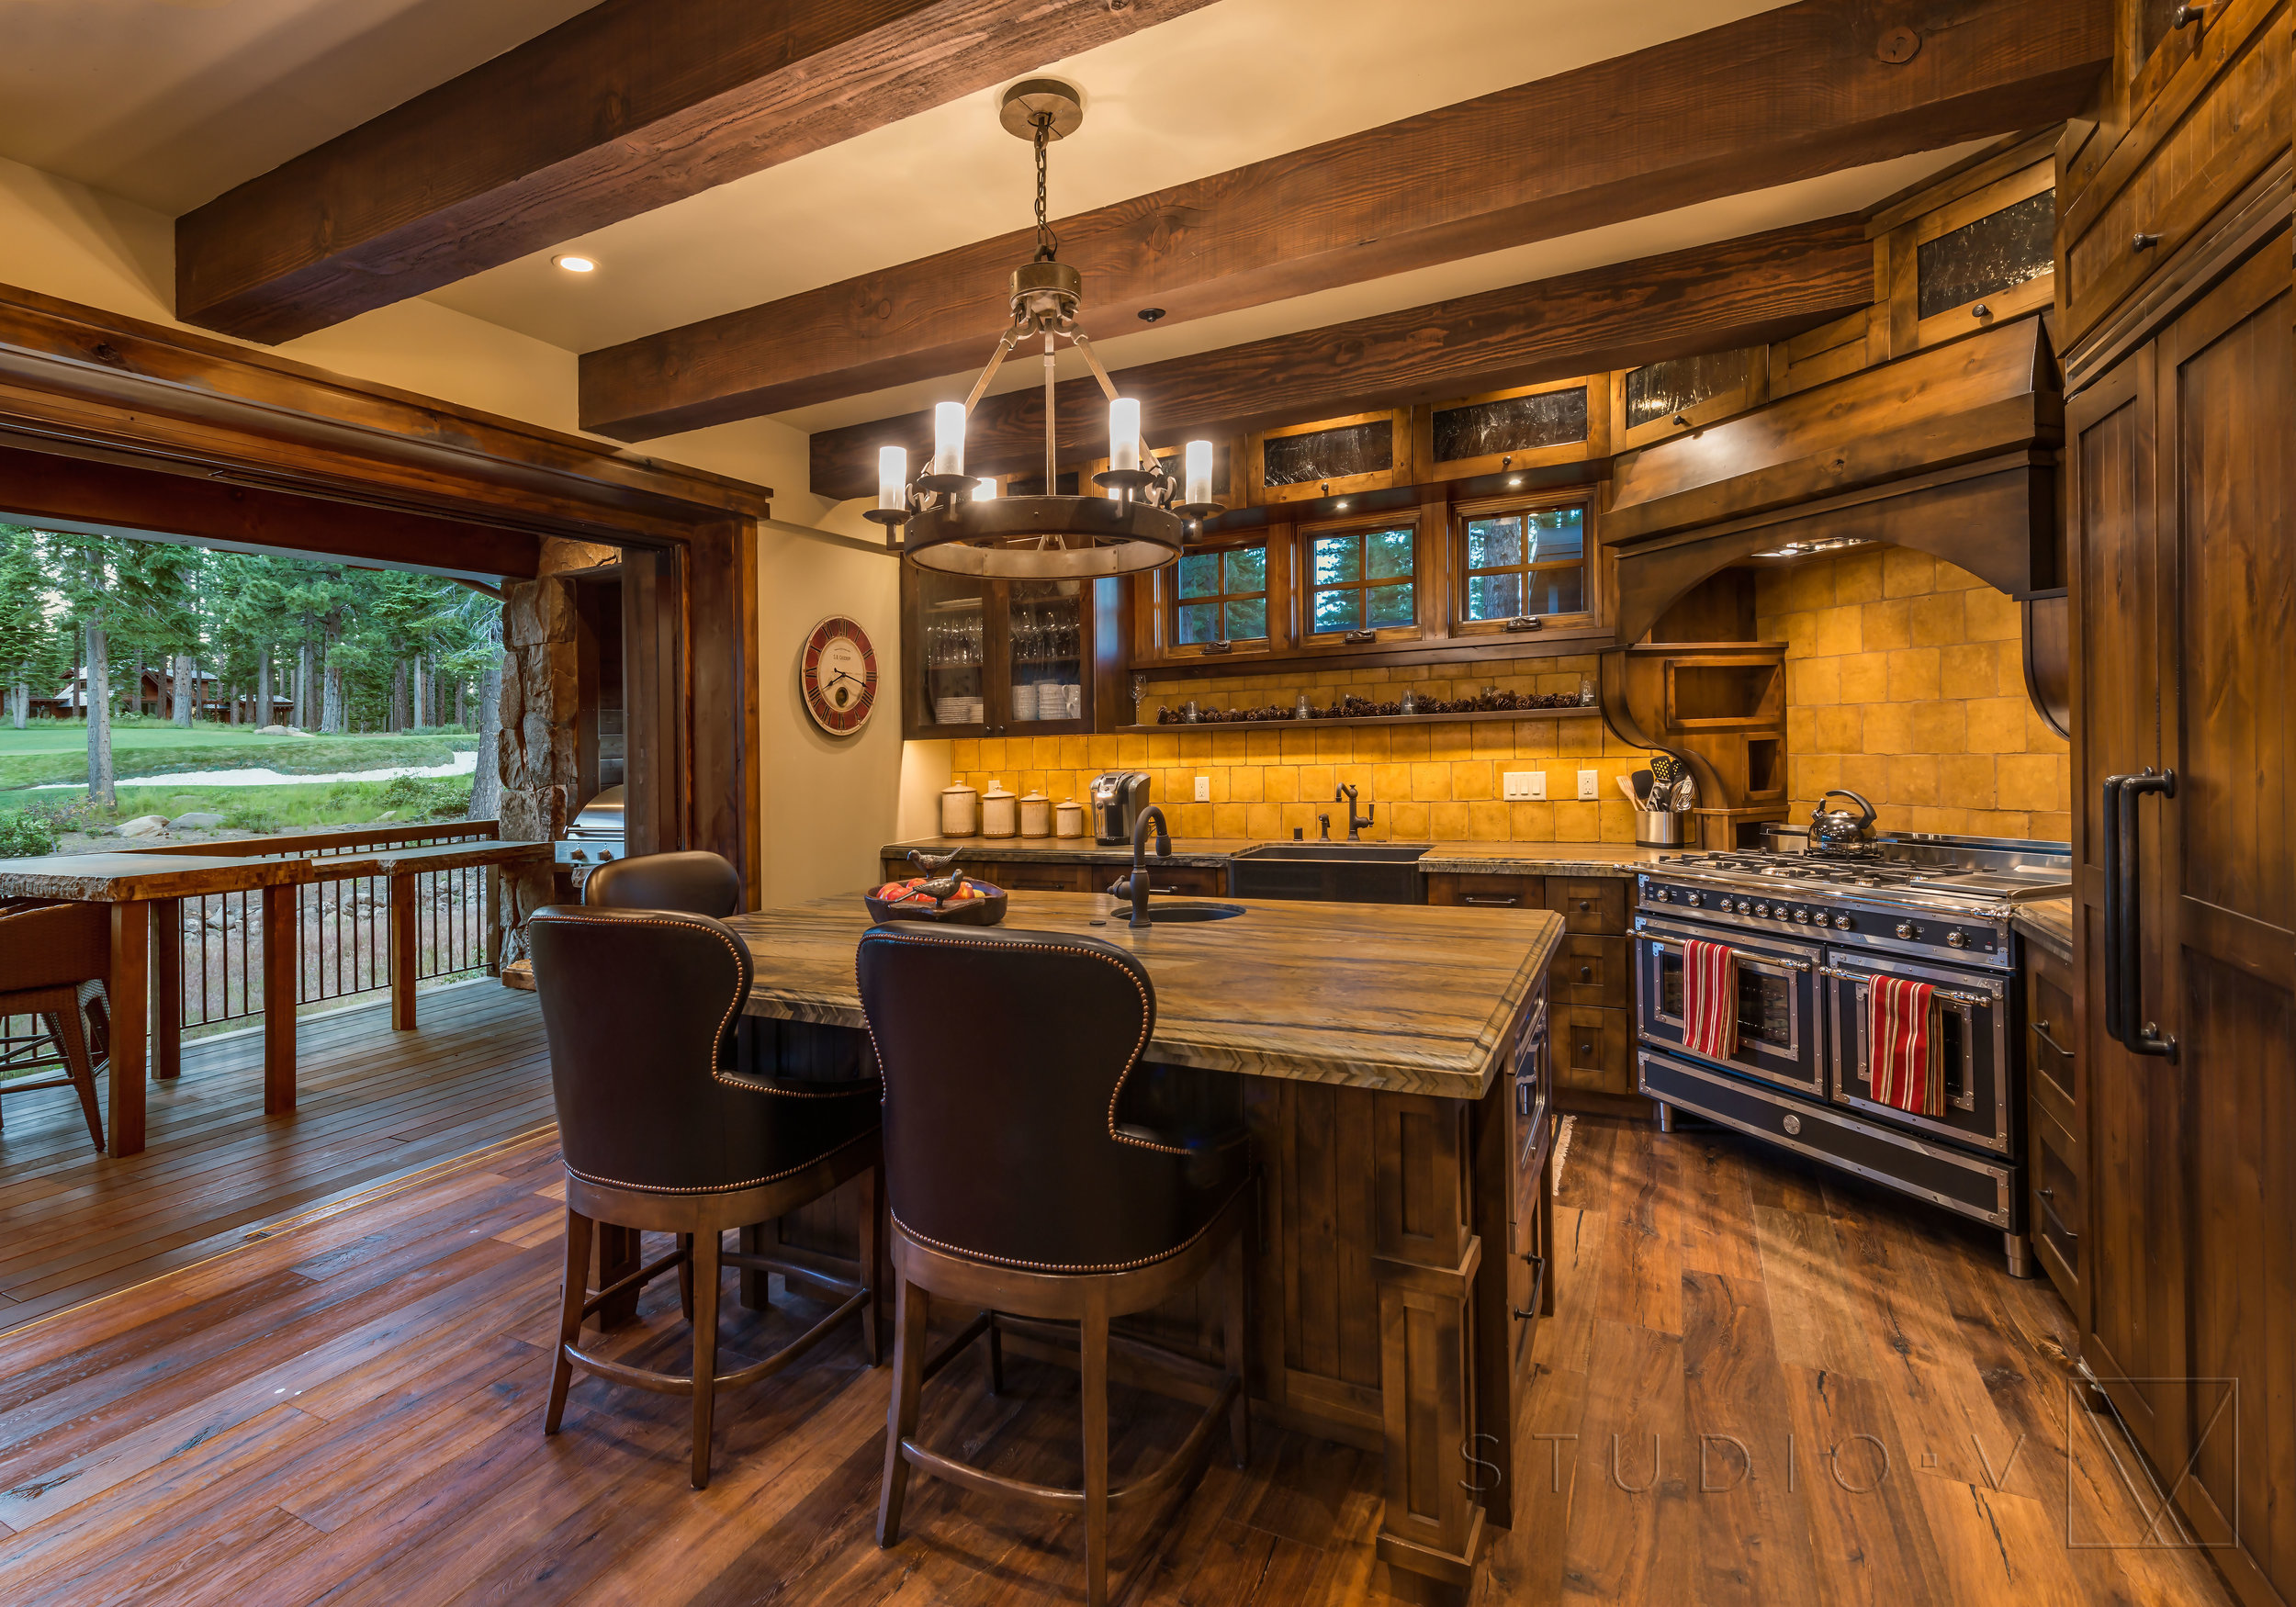 Lodge Cabin Tahoe Truckee Martis Camp CA California Traditional Studio V Interior Architecture Design Scottsdale Arizona AZ (30).jpg